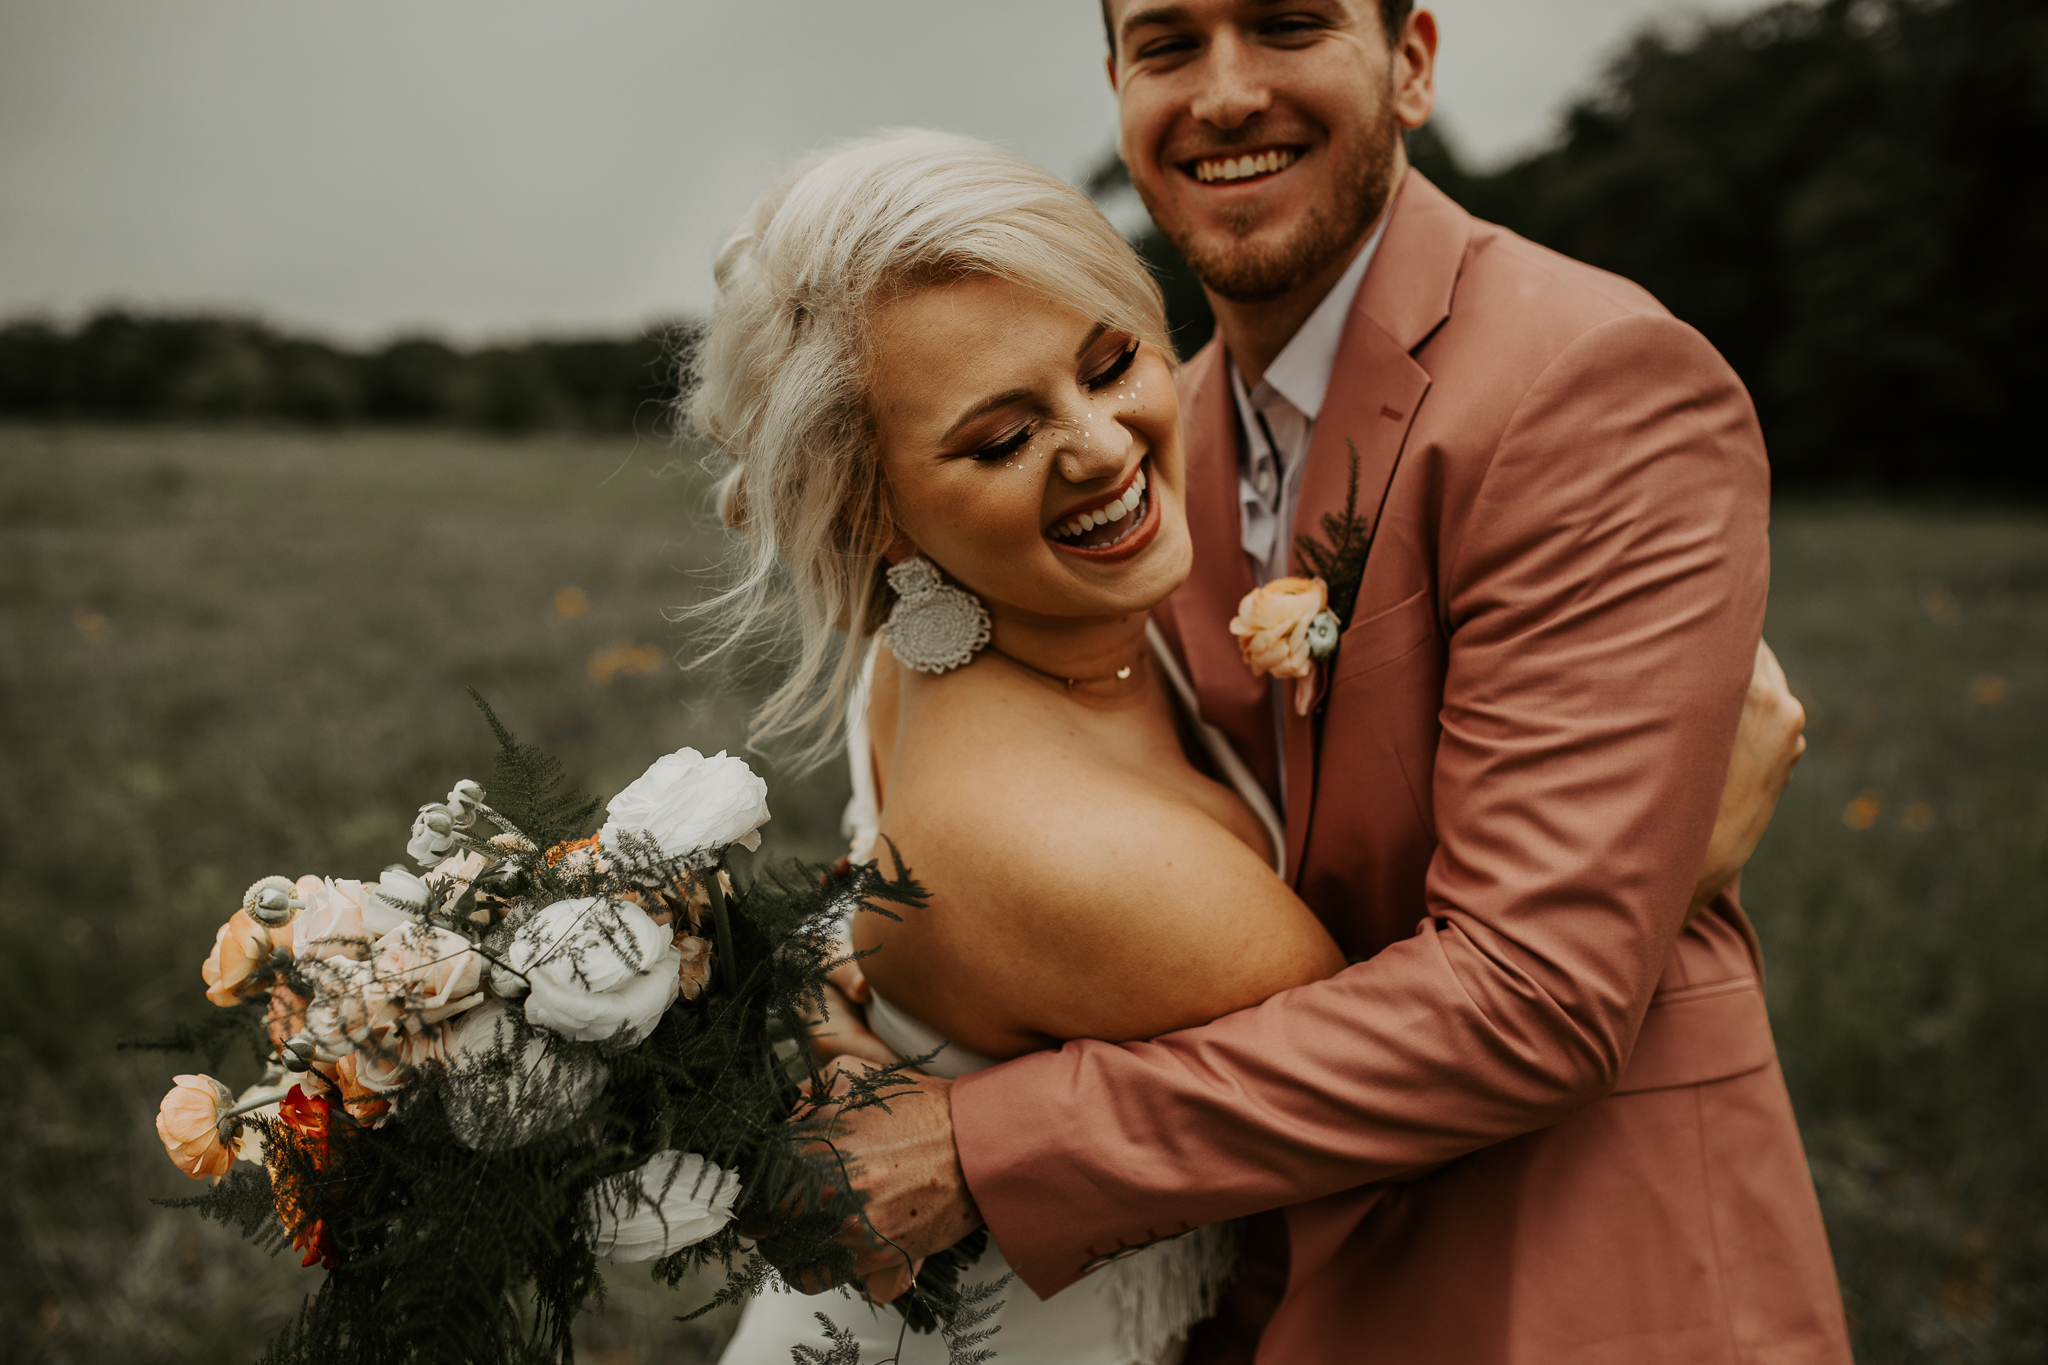 Laken-Mackenzie-Photography-Establishment-Barn-Terrell-Texas-DFW-Wedding-Photographer (2 of 5).jpg